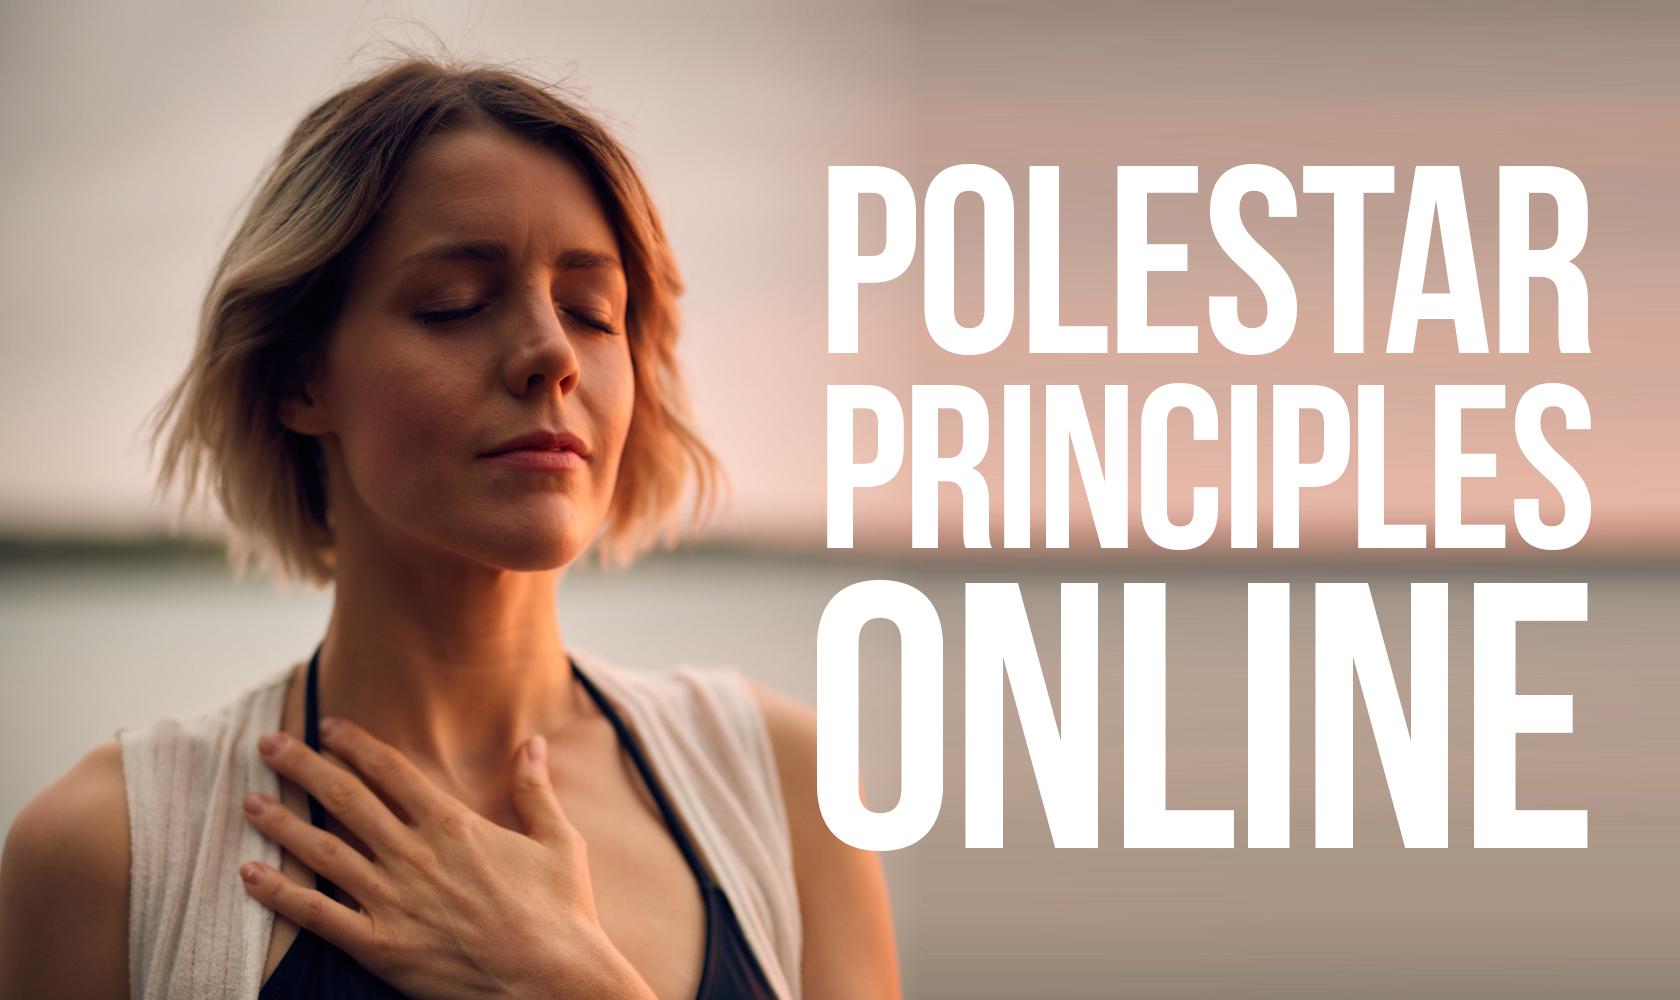 Polestar Principles Online